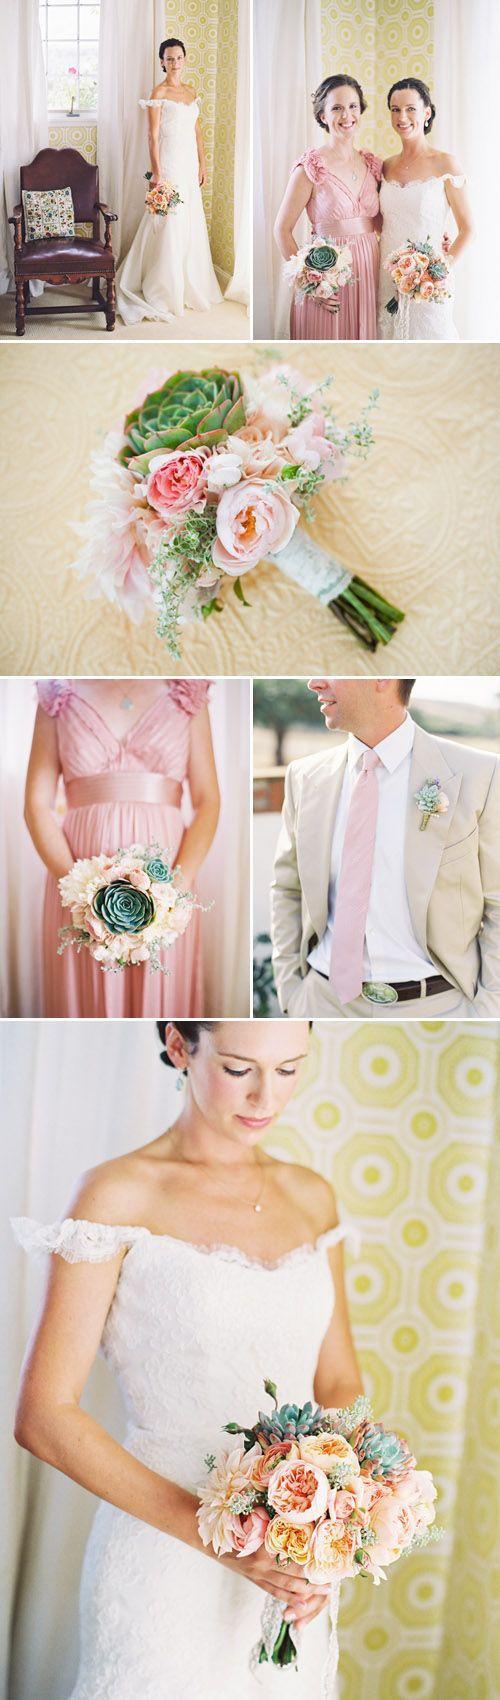 Свадьба - Coral And Peach Wedding Inspiration